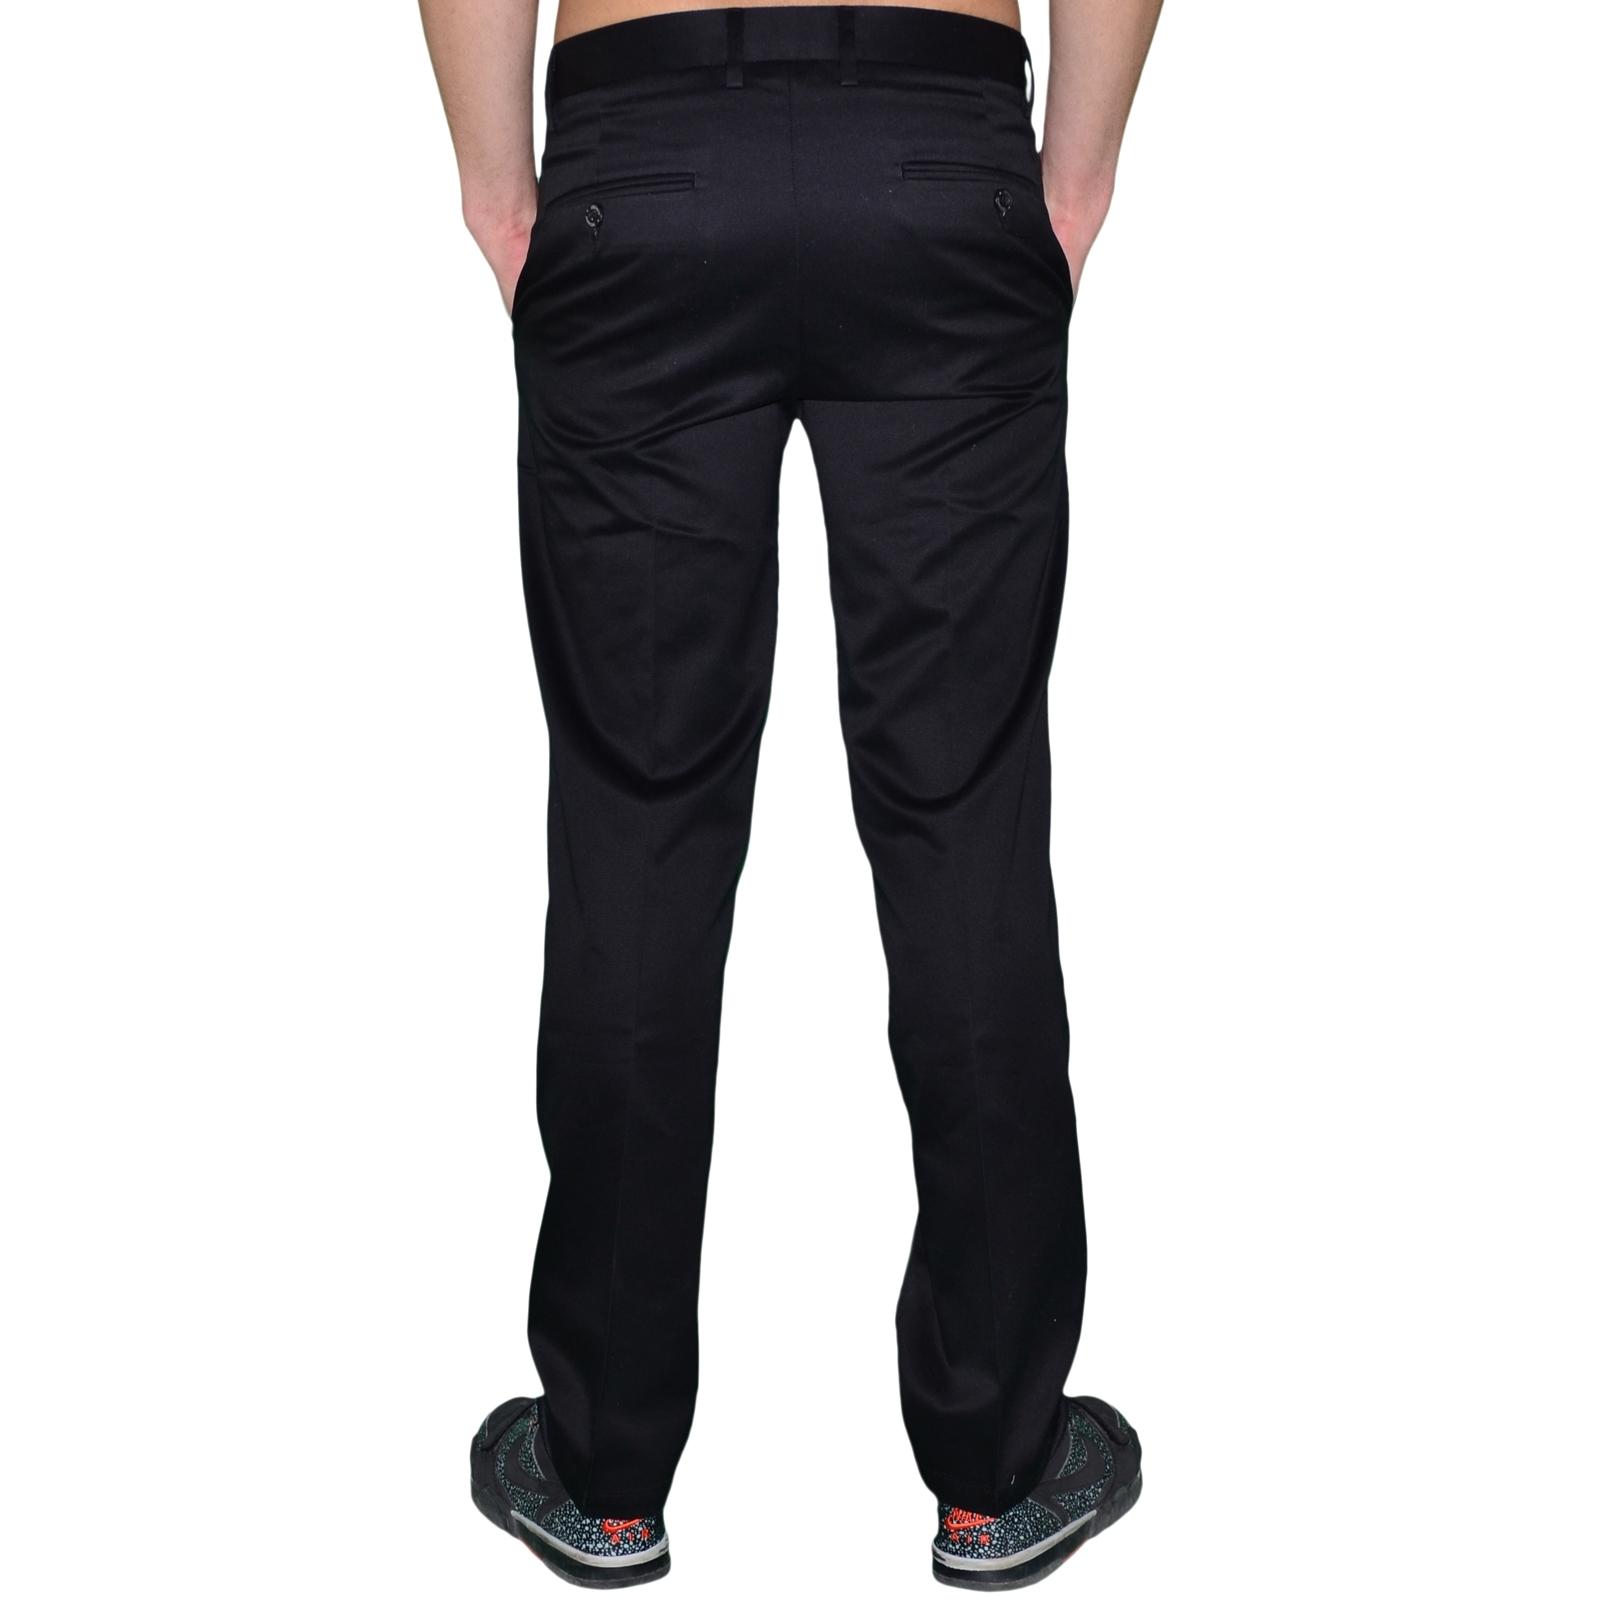 pantalon chino homme noir. Black Bedroom Furniture Sets. Home Design Ideas